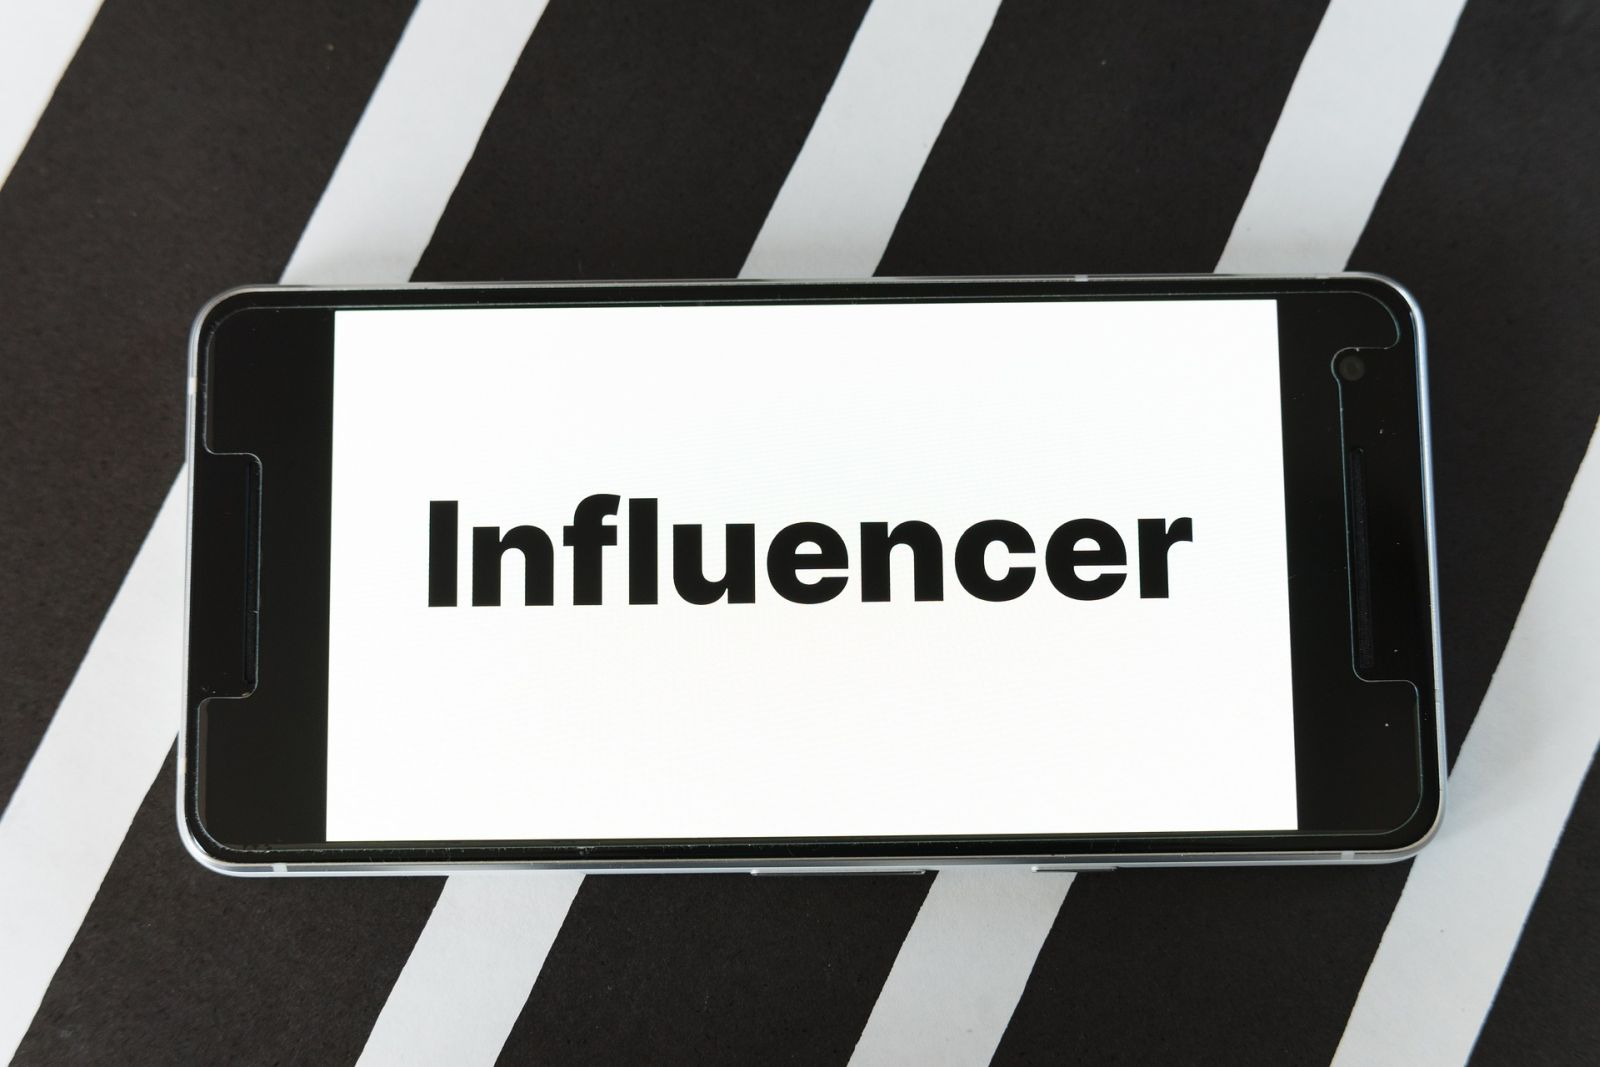 Egipat planira oporezivati influencere: Regulirat će rad blogera i youtubera